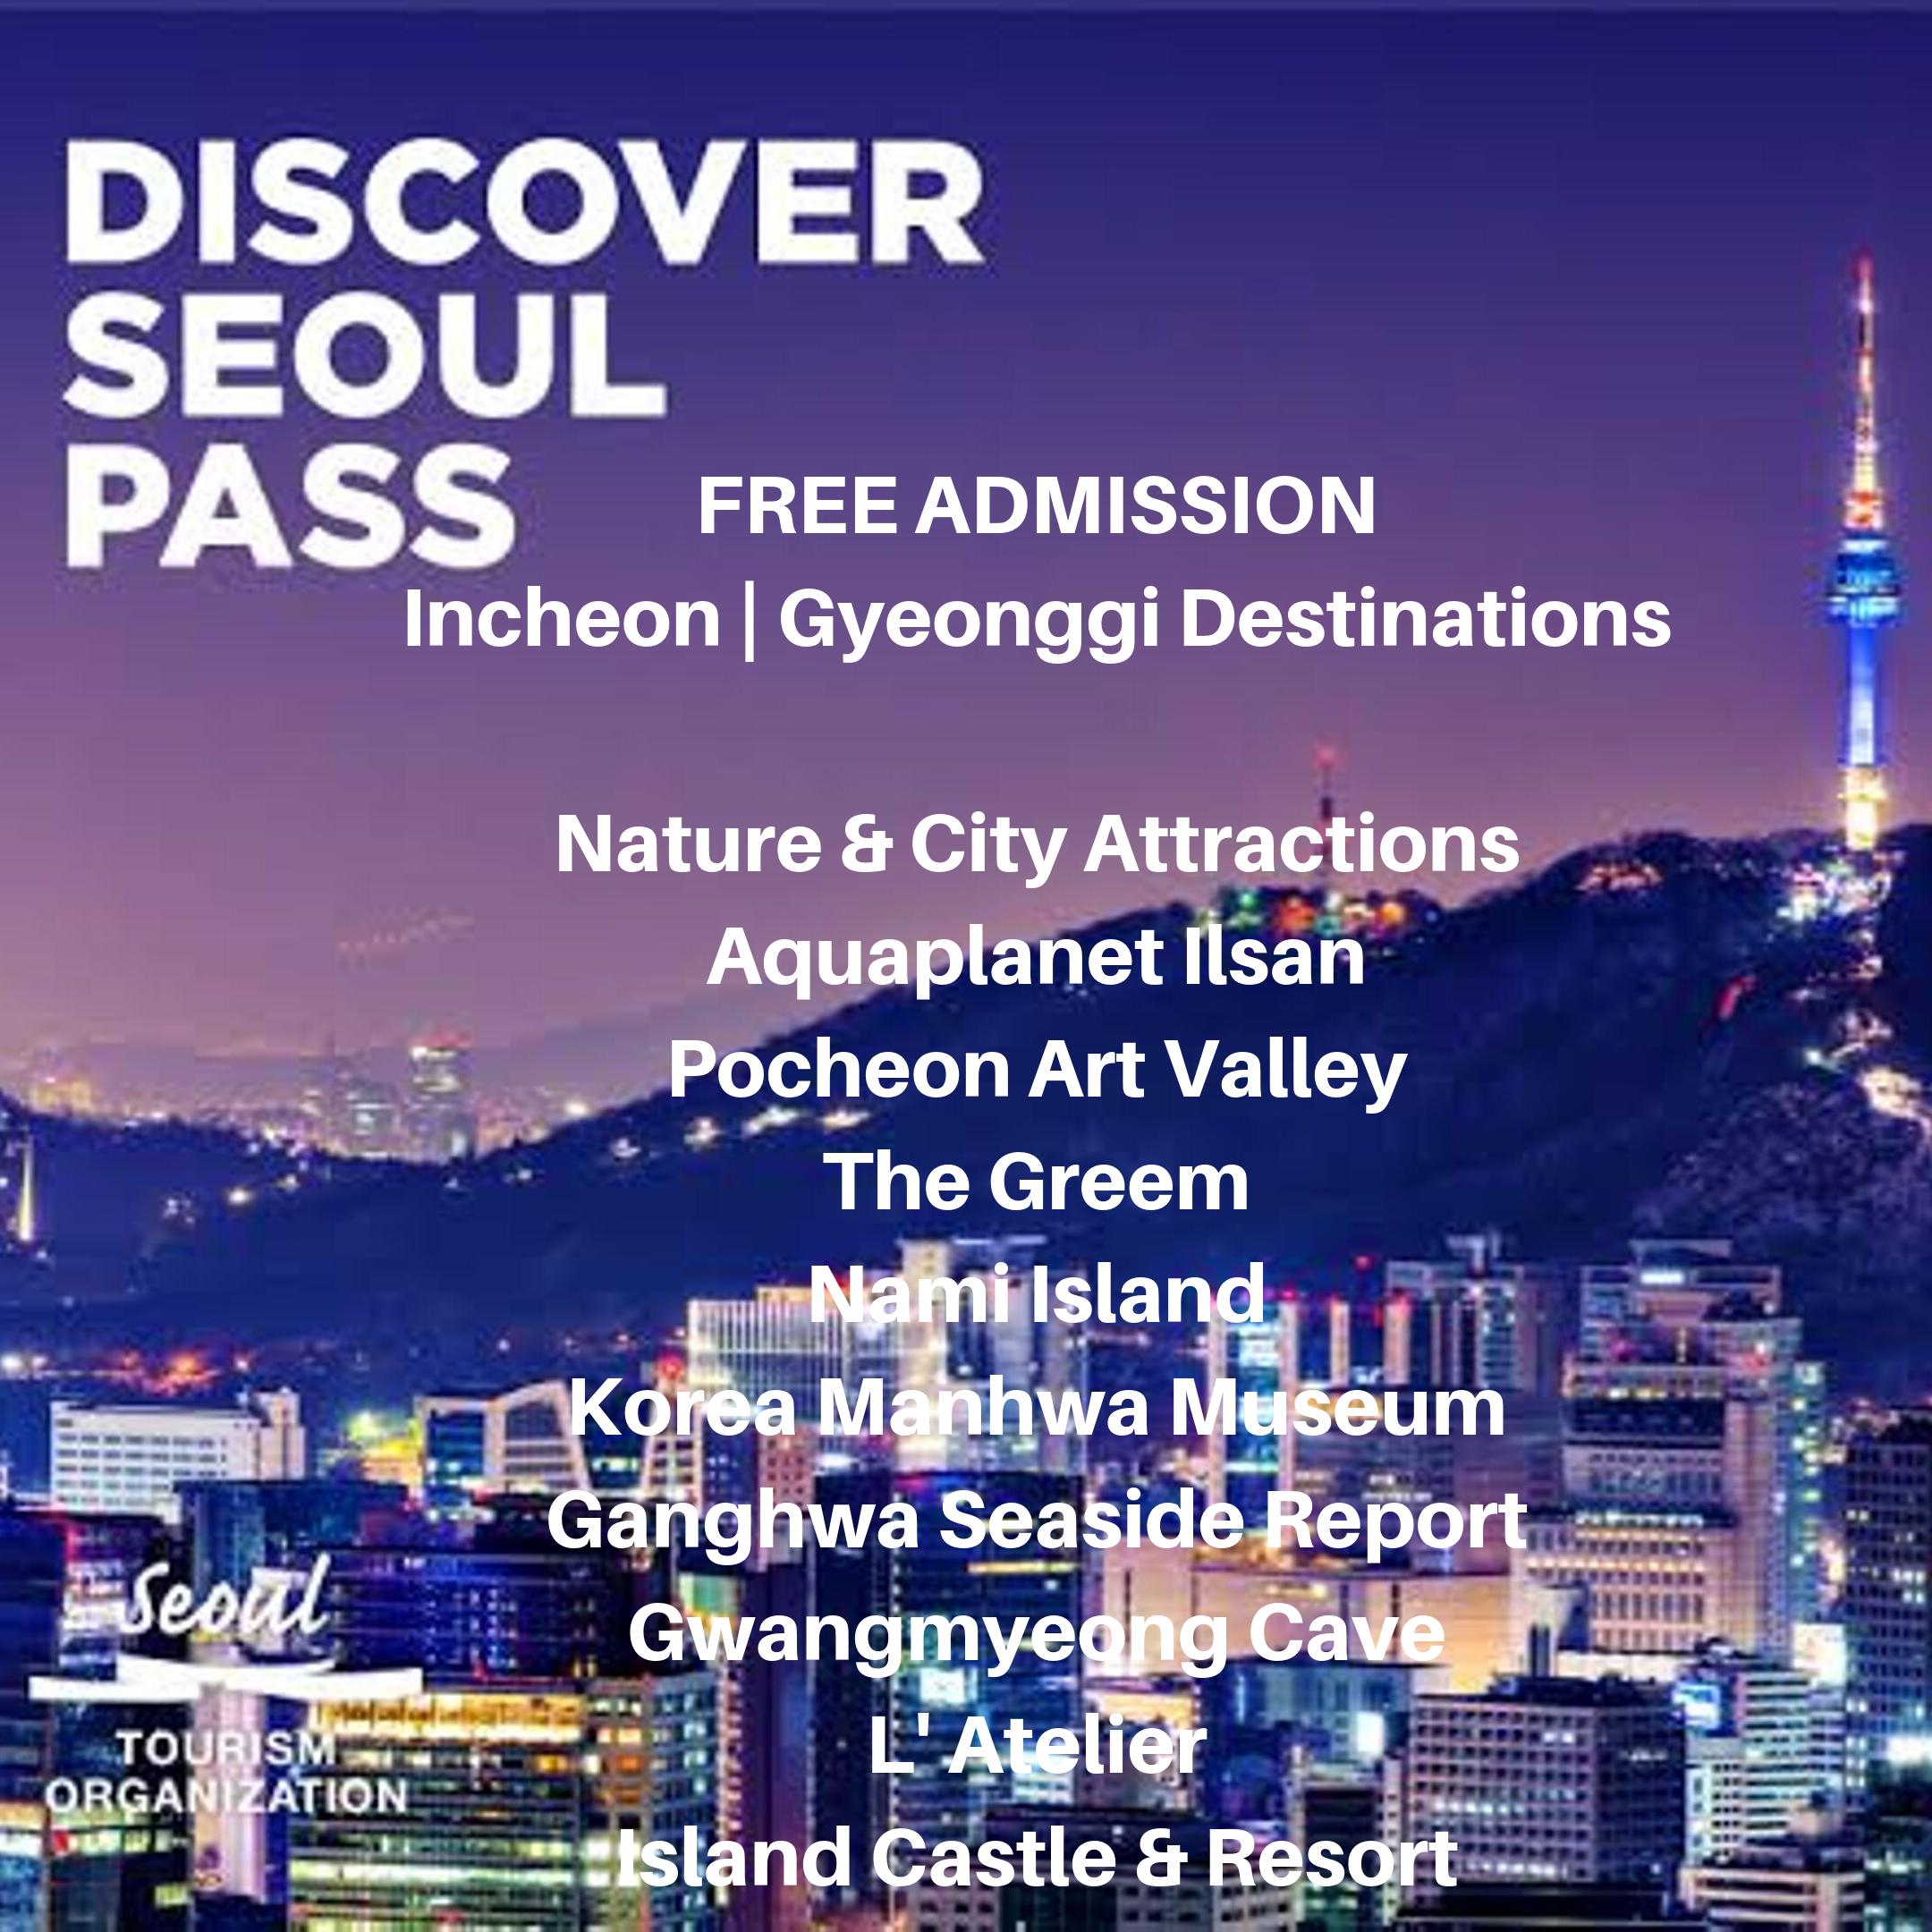 Discover Seoul Pass Seoul Plus Edition